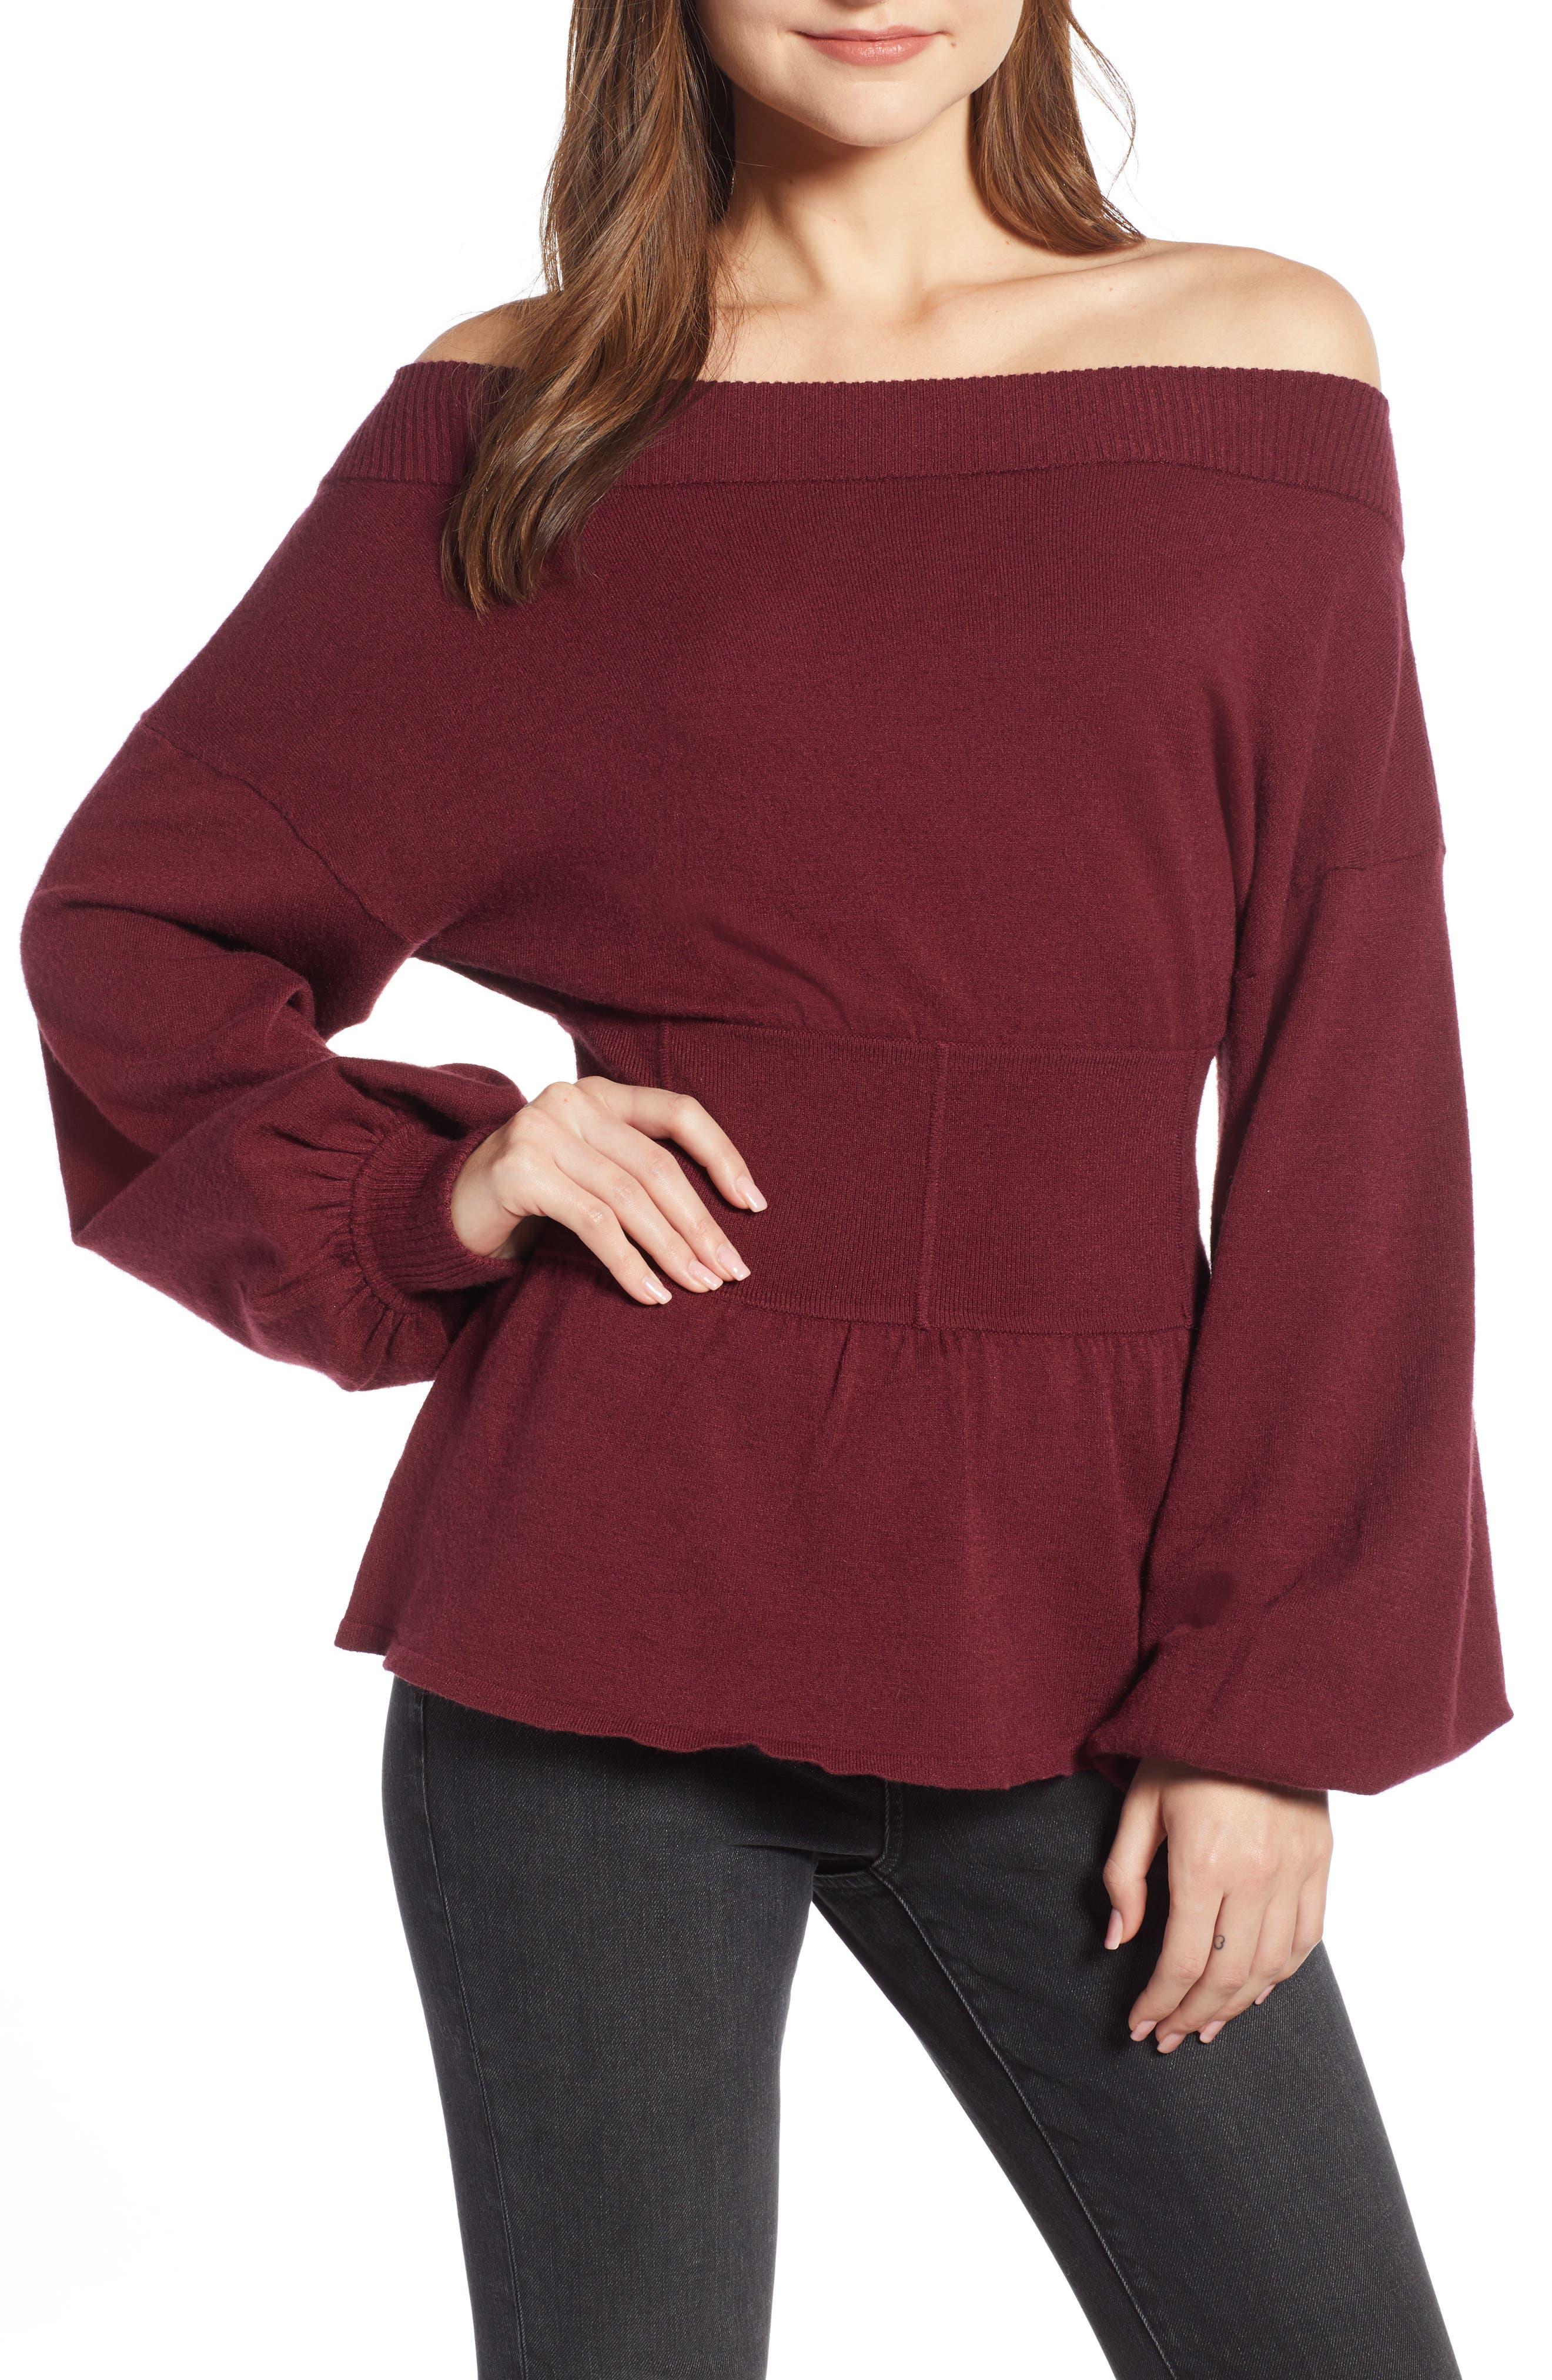 Waist Detail Off the Shoulder Sweater, Main, color, 601